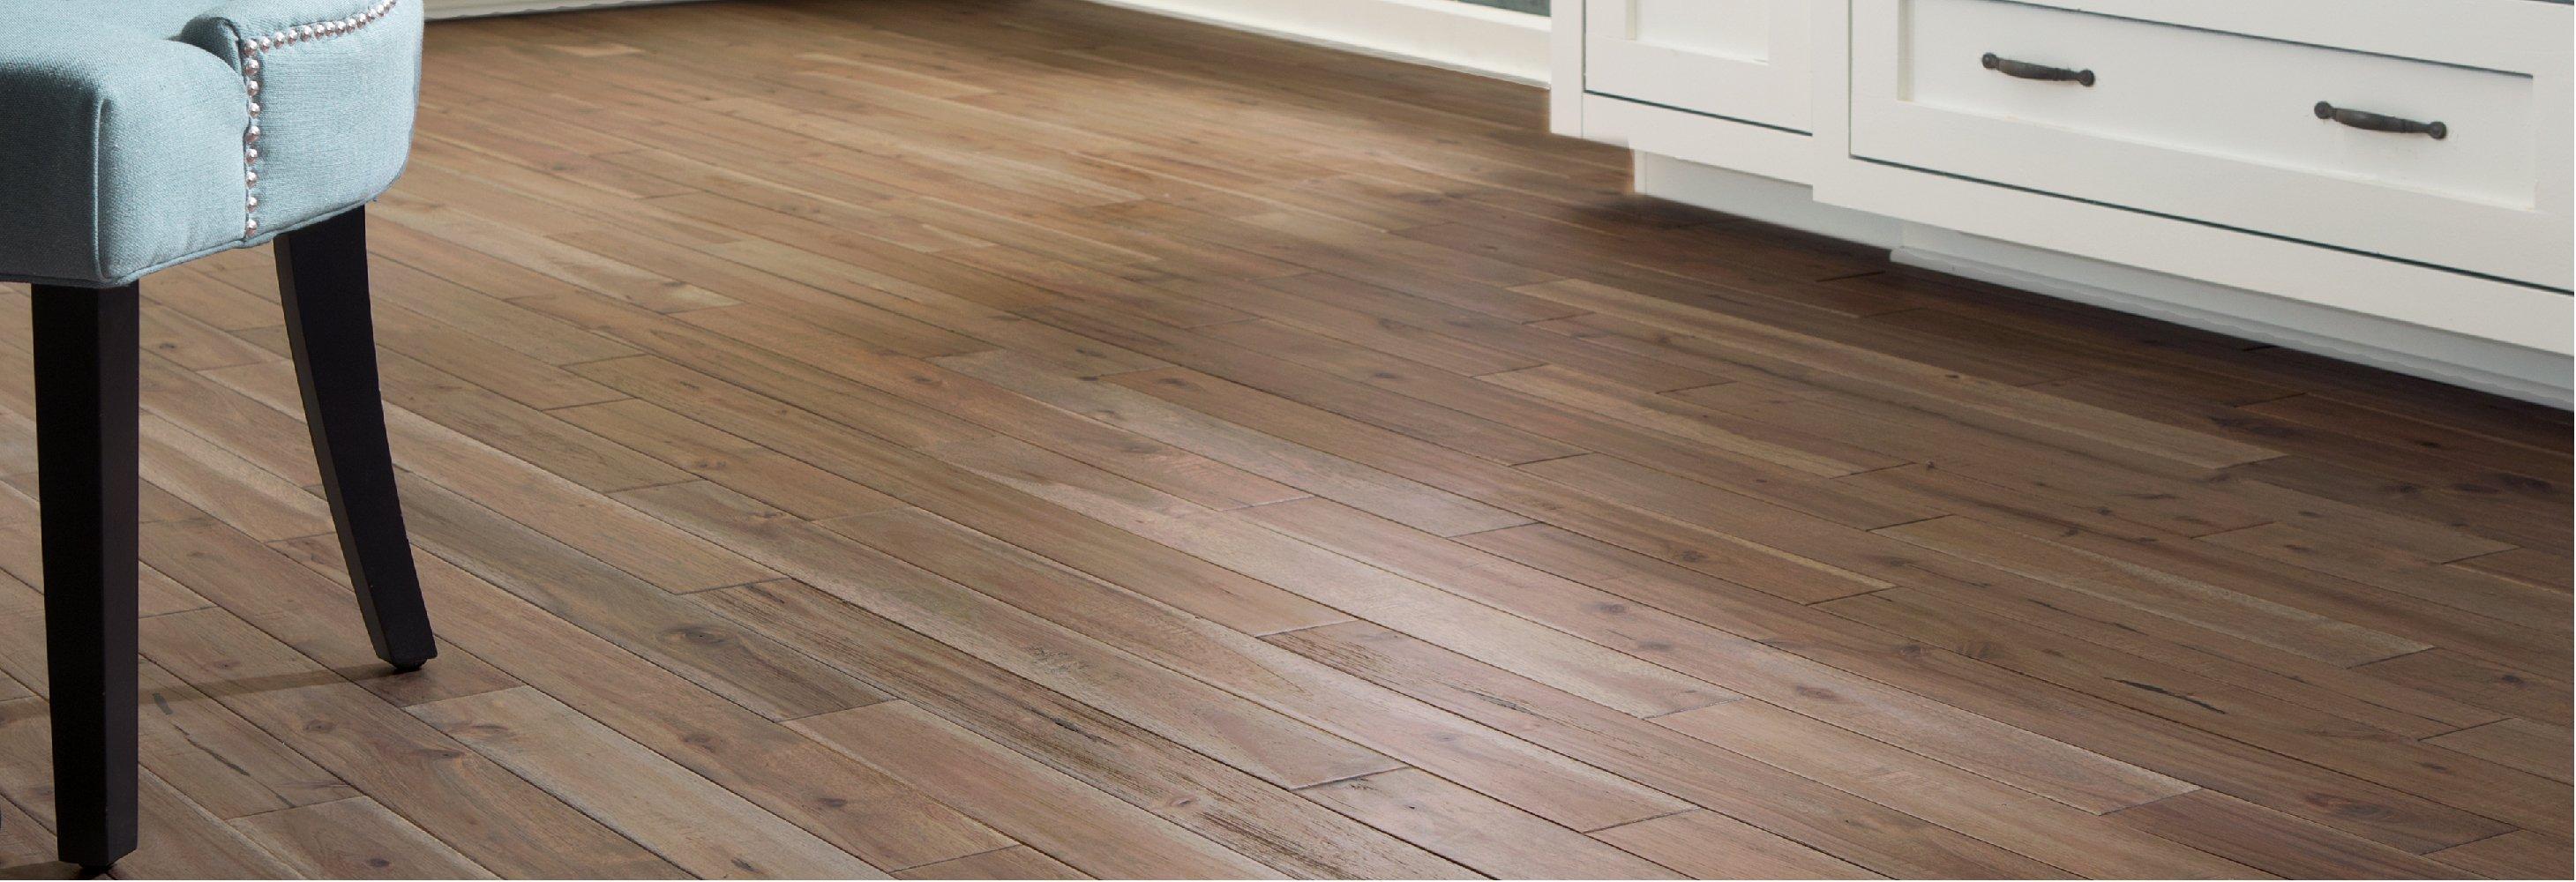 solid hardwood flooring FZOQMBC